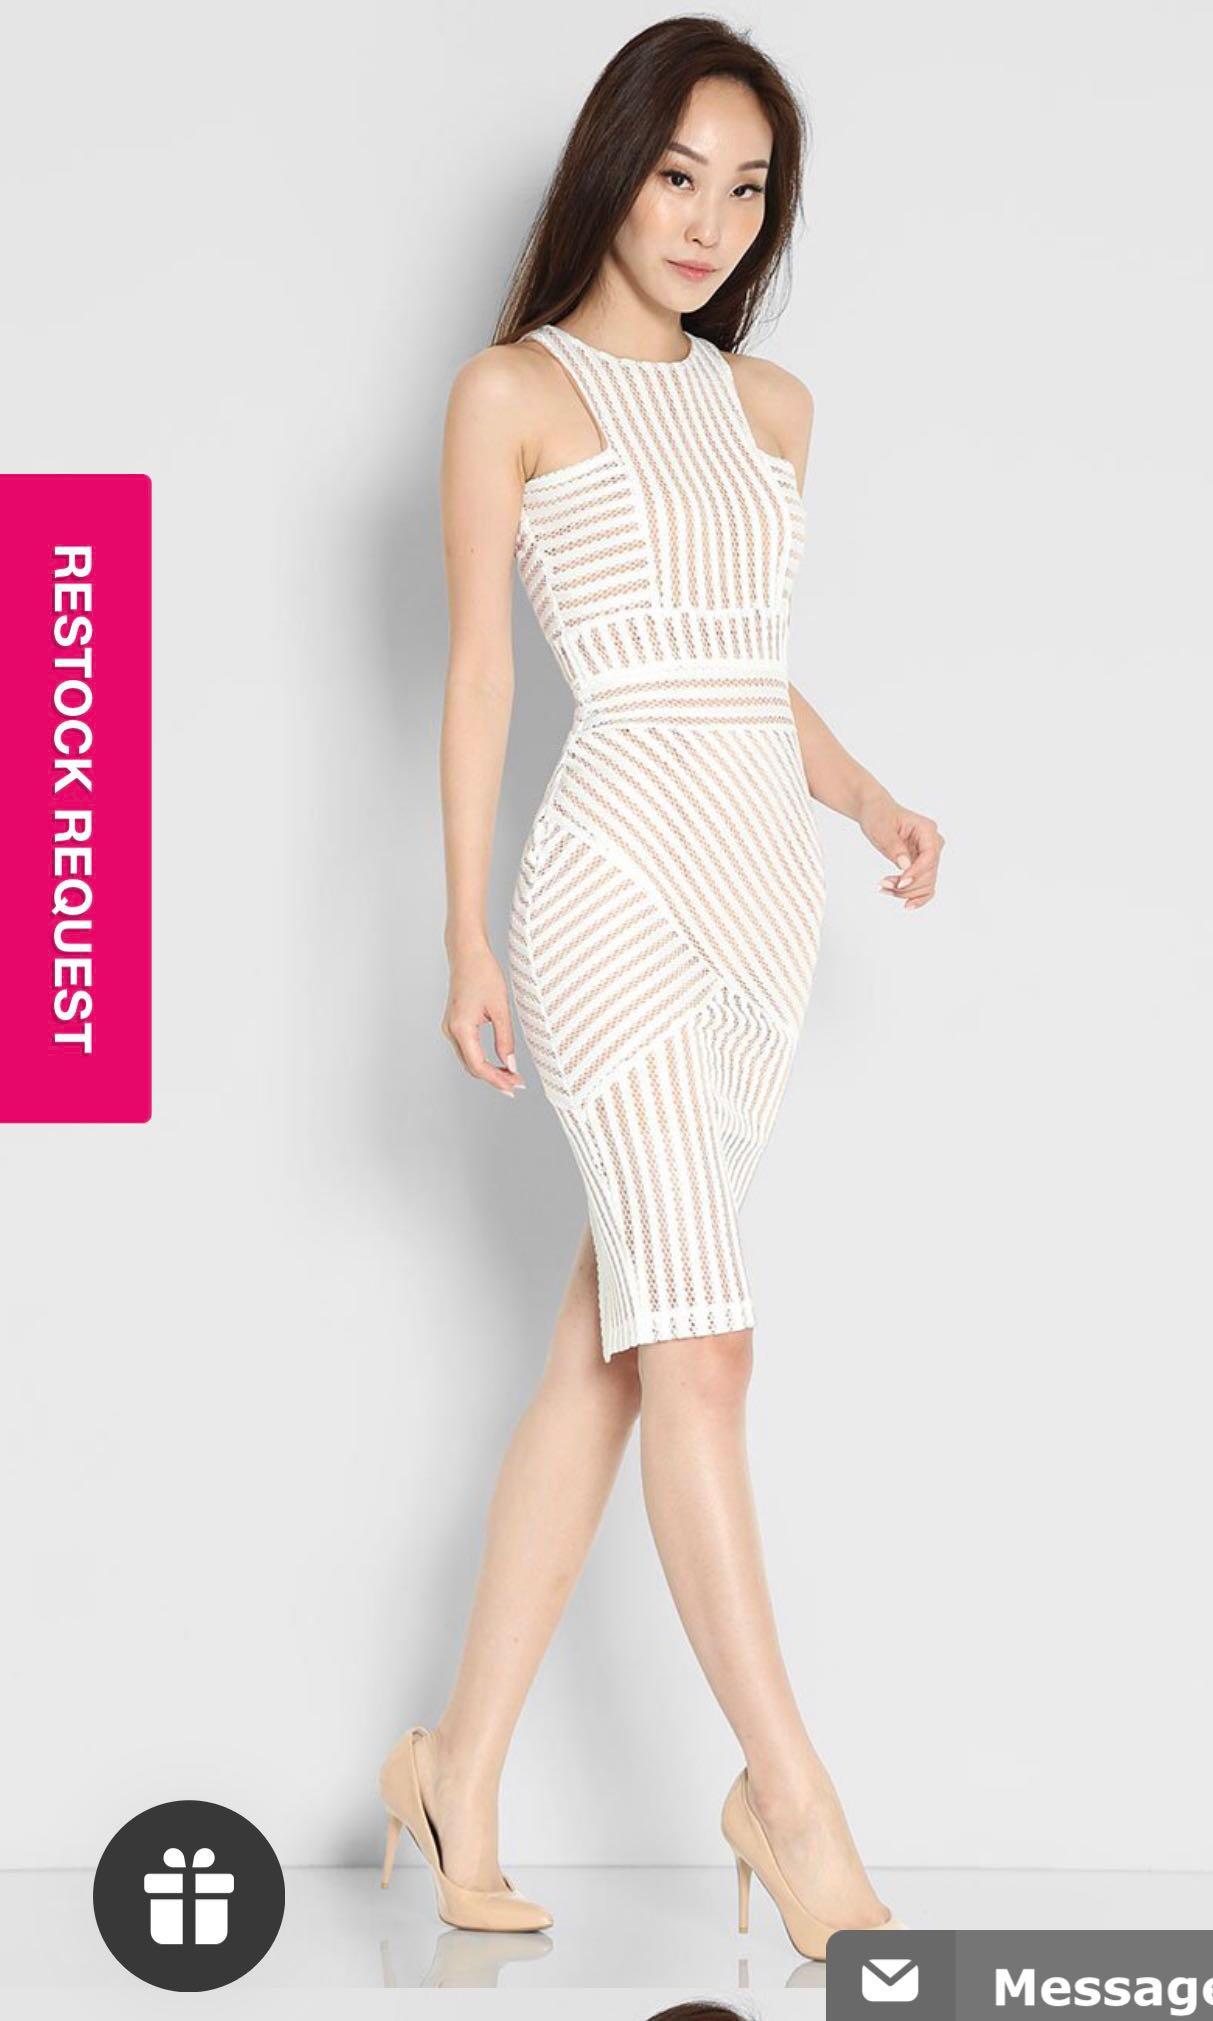 2e6ca826de86 Lara j ilaria nude dress, Women's Fashion, Clothes, Dresses & Skirts ...